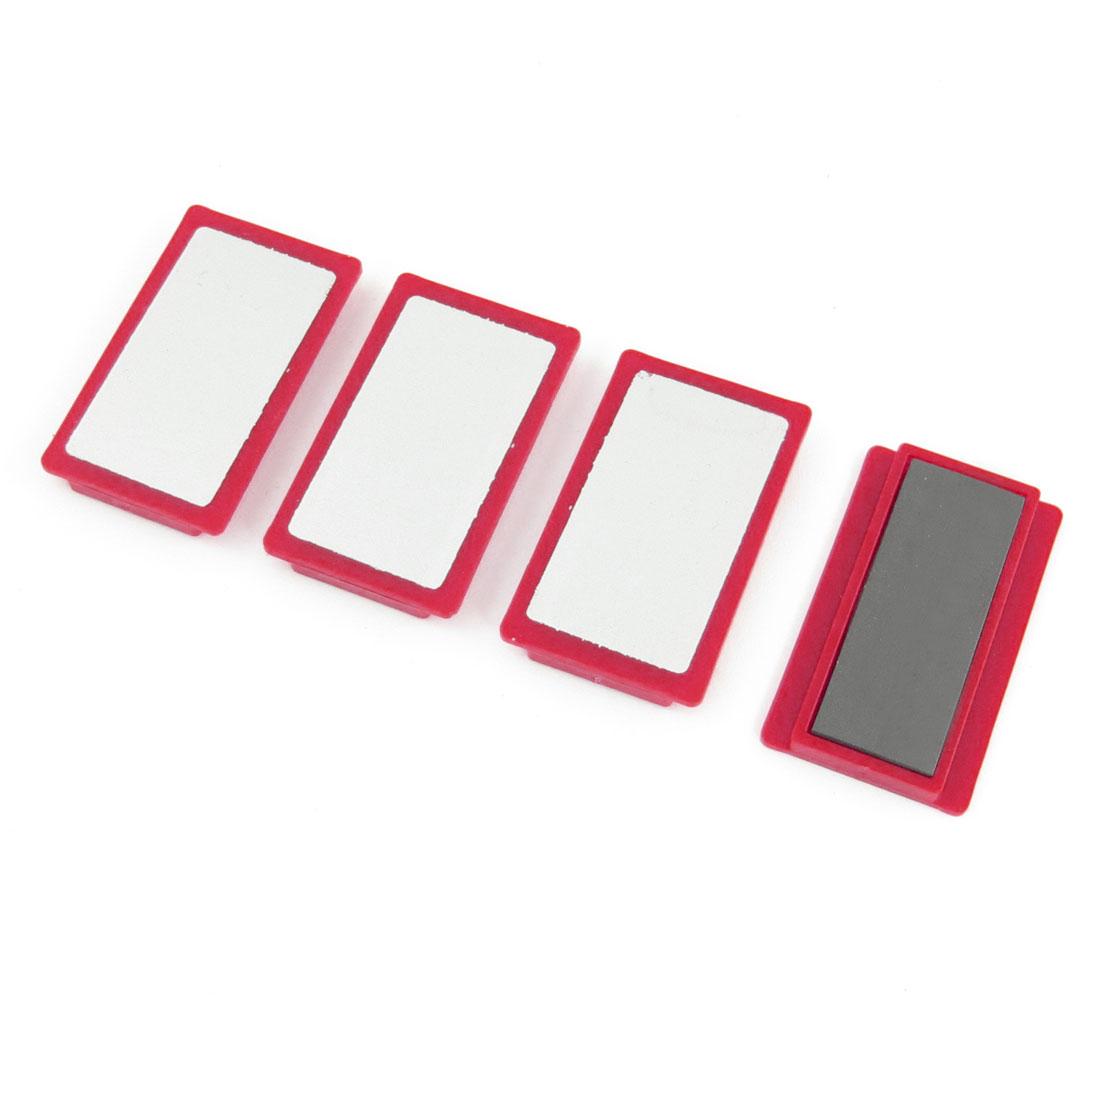 4pcs 5cm x 3cm Red Plastic Frame Whiteboard Magnetic Stripes for Office